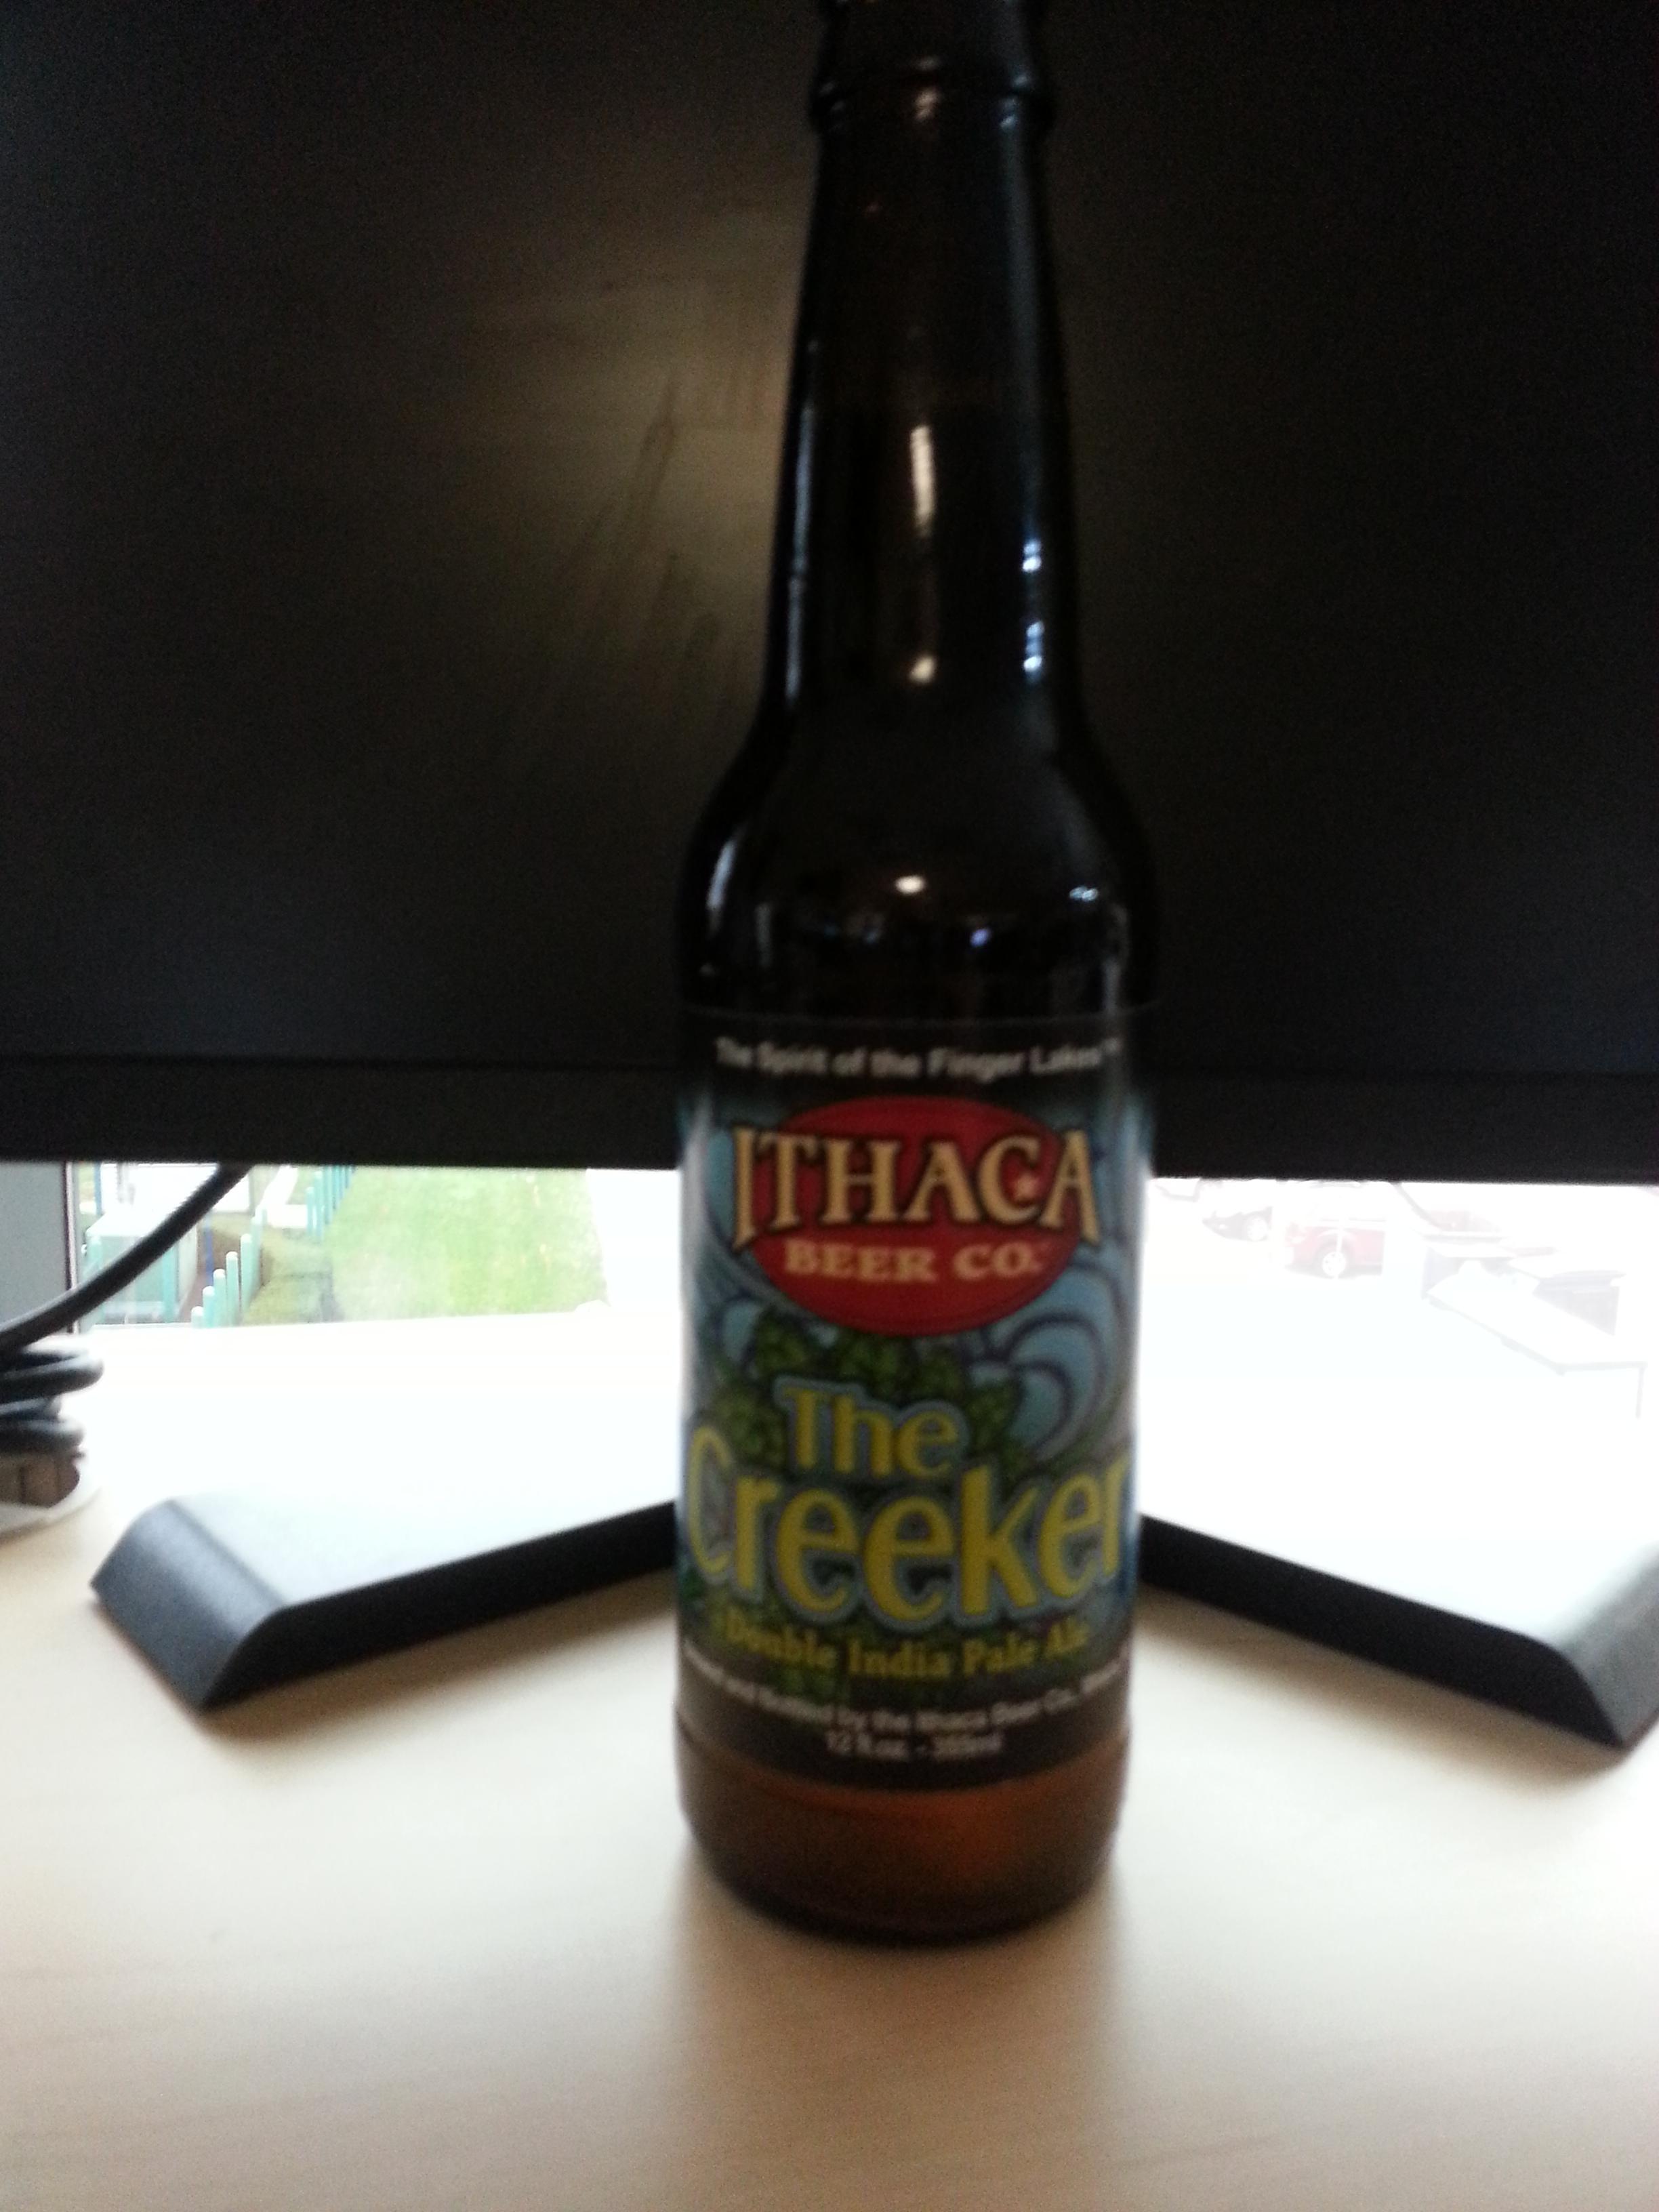 Ithaca The Creeker Double IPA